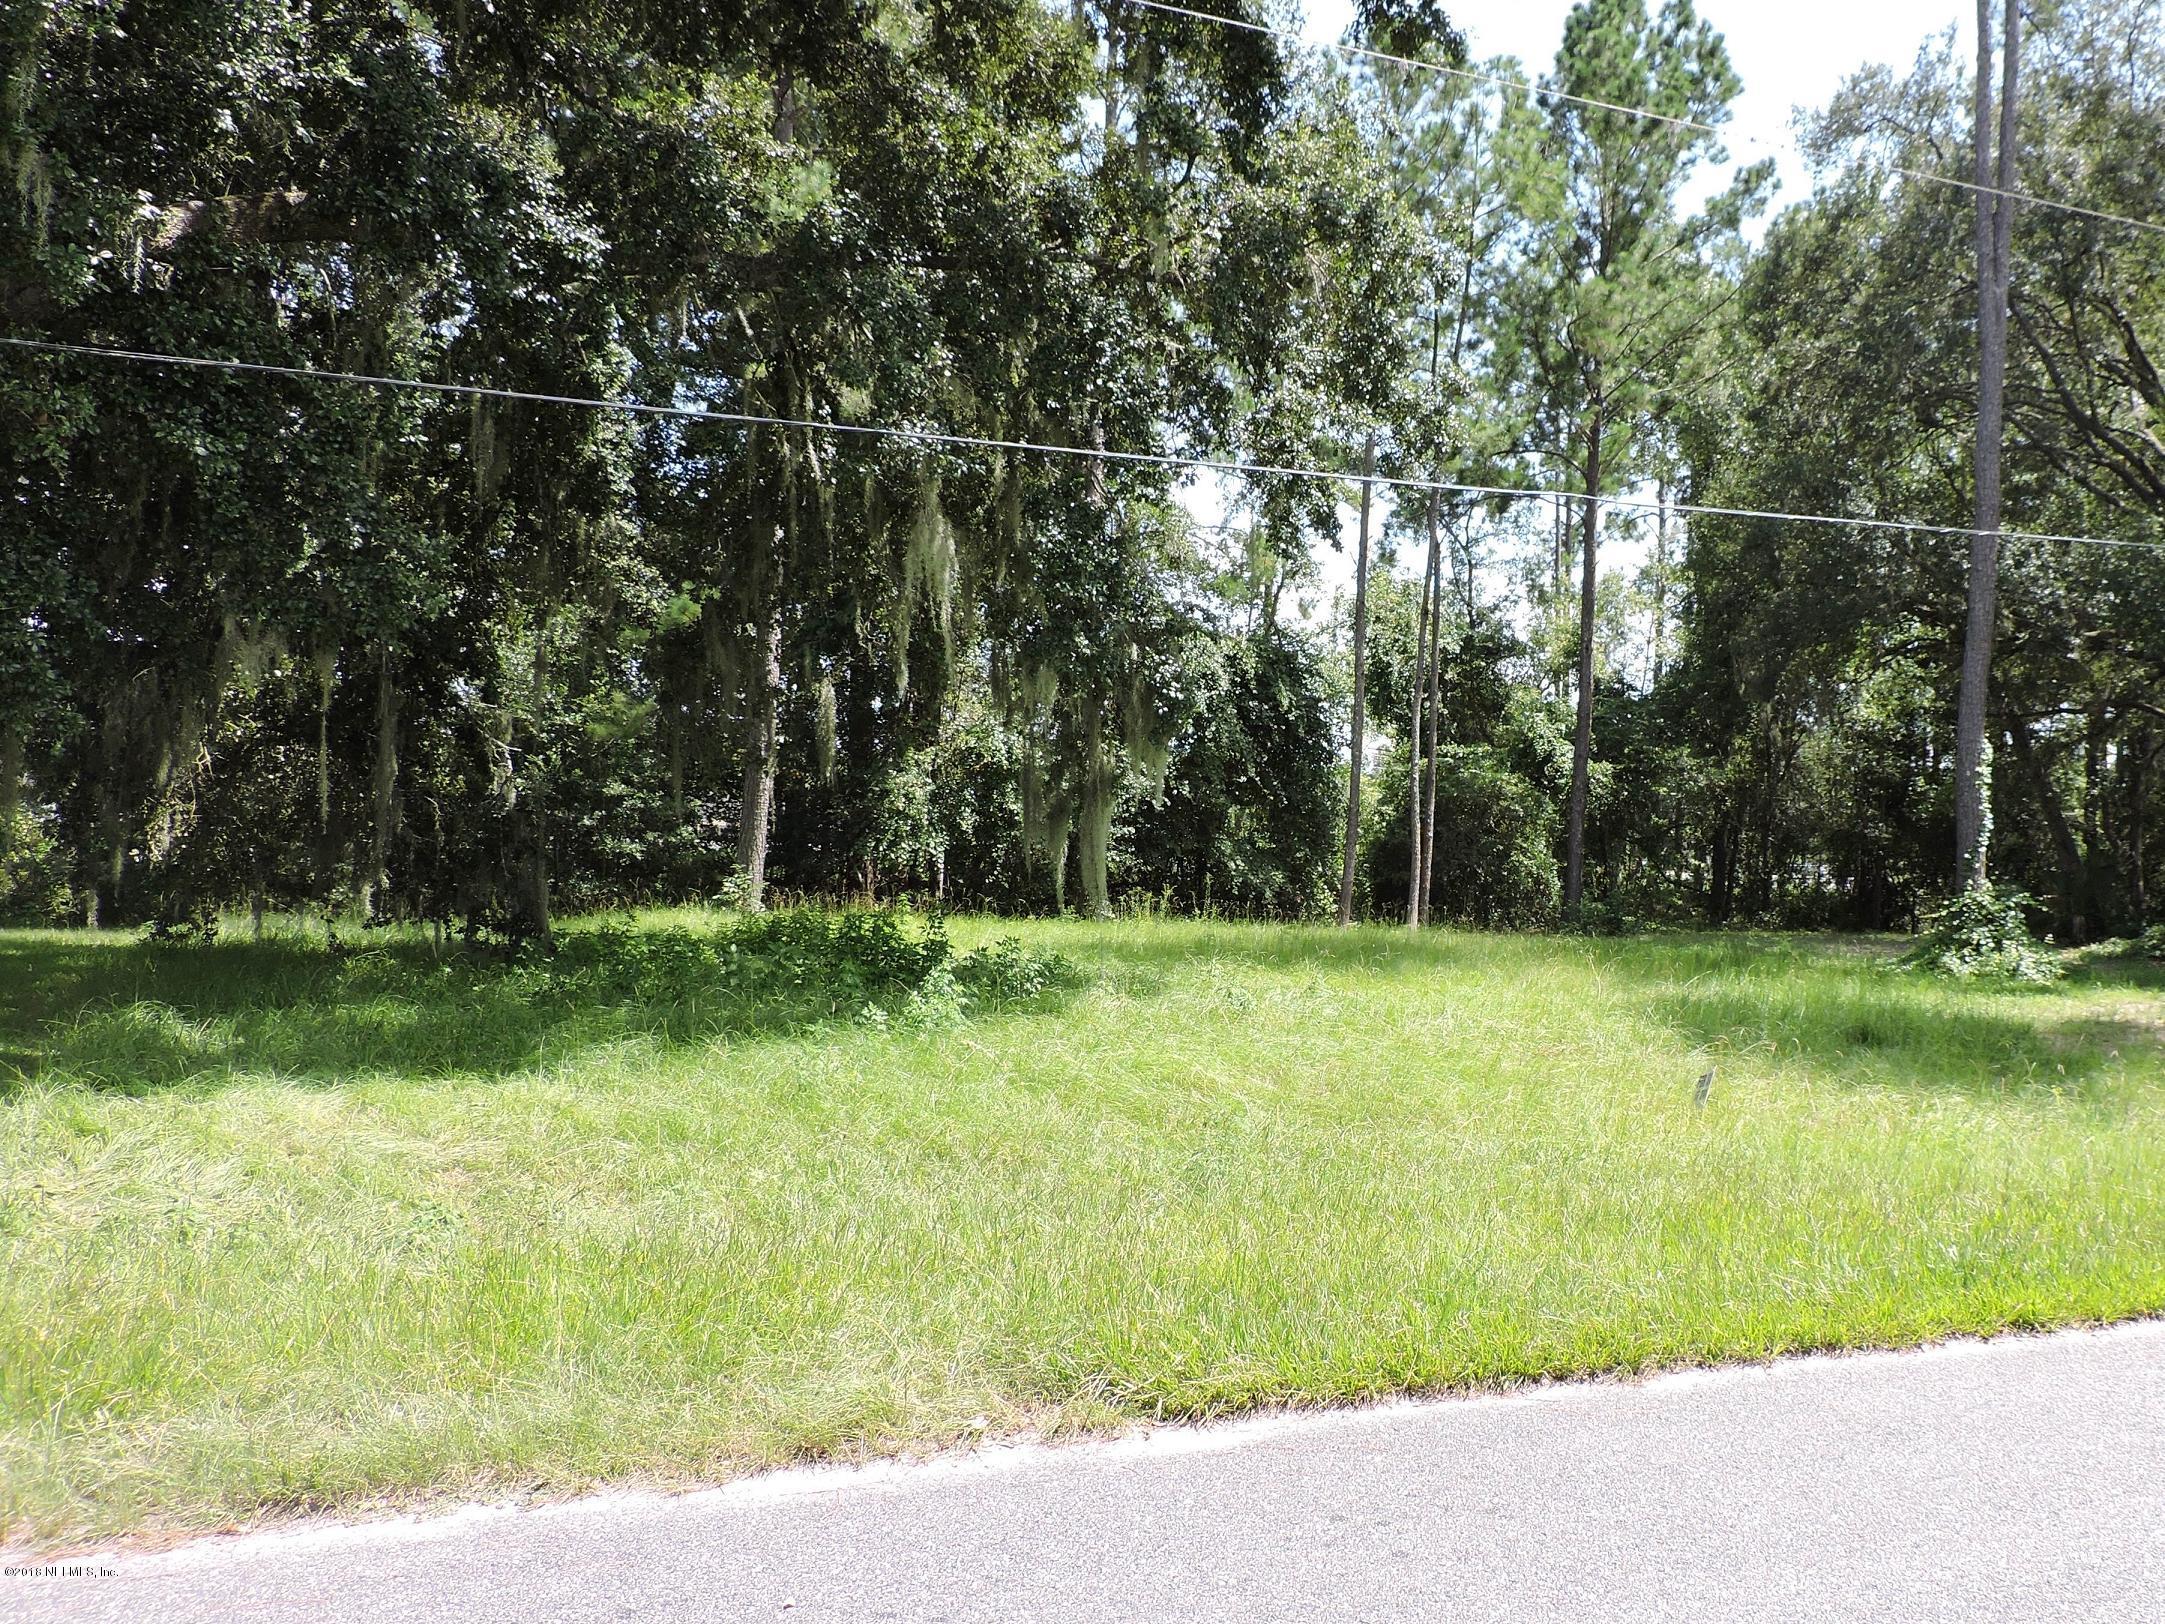 0 BOICE, BUNNELL, FLORIDA 32110, ,Vacant land,For sale,BOICE,952253